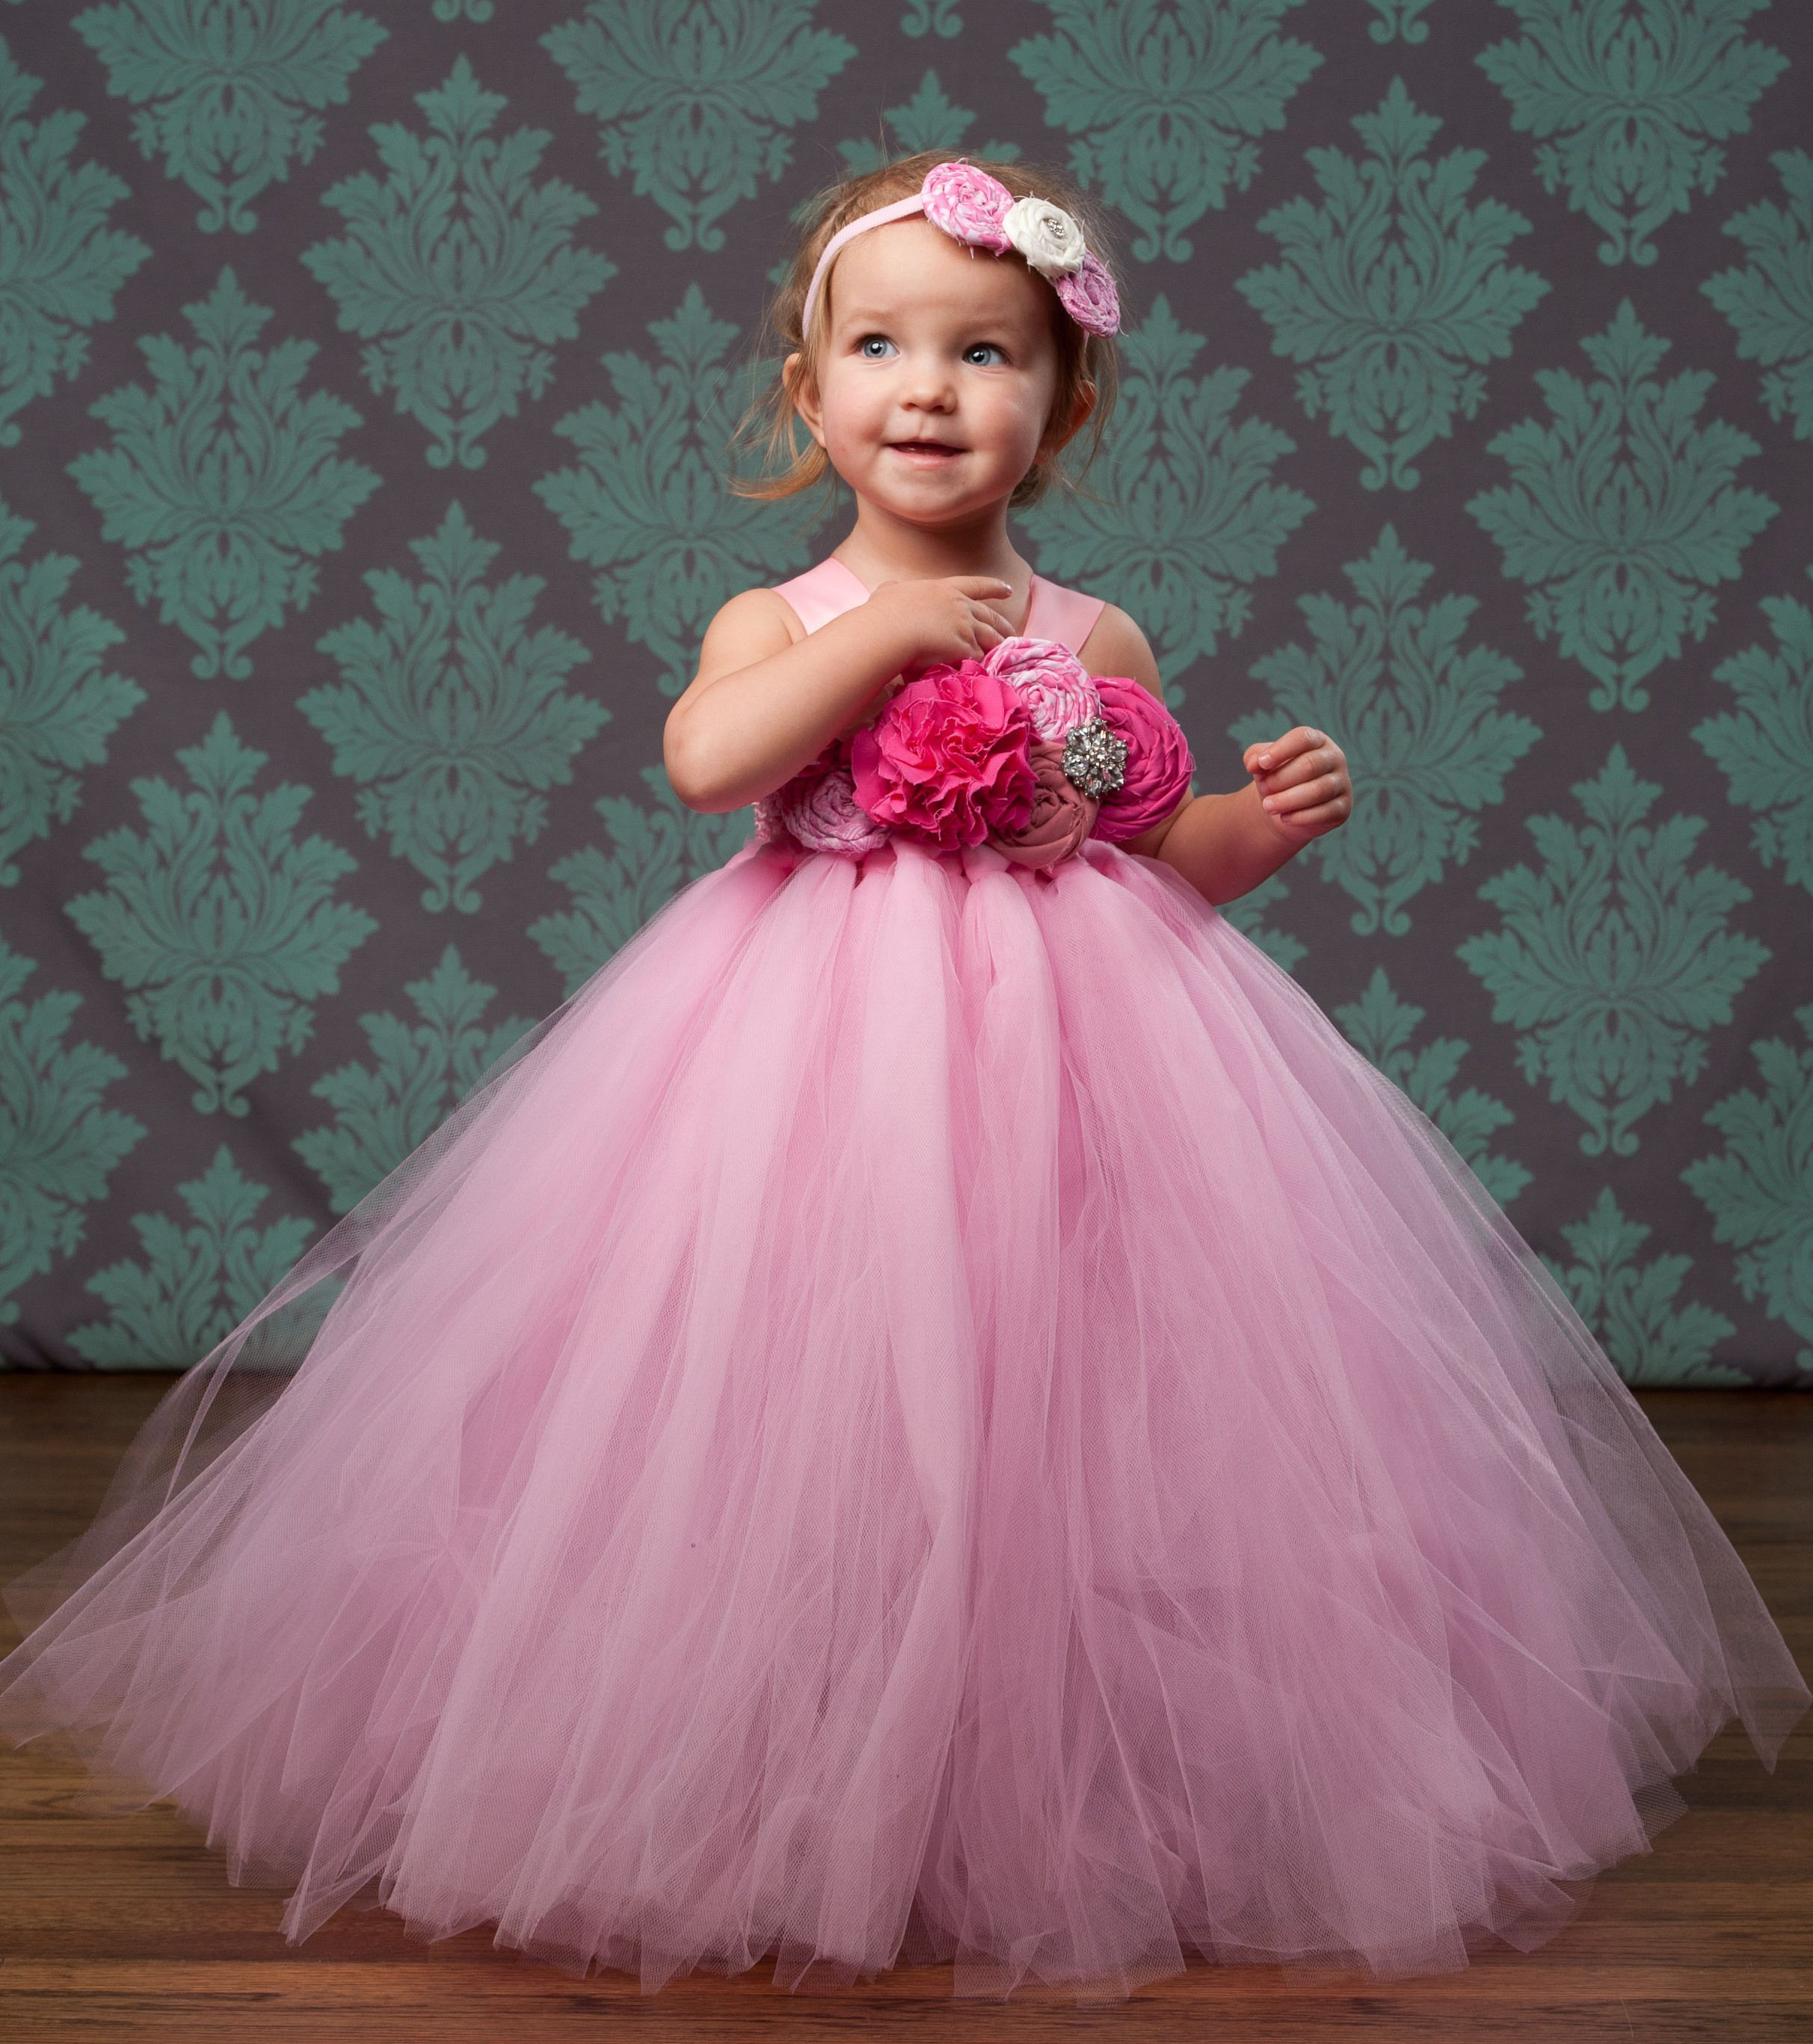 flower girl tutu style dress | vestidos lindos | Pinterest | Pajes ...